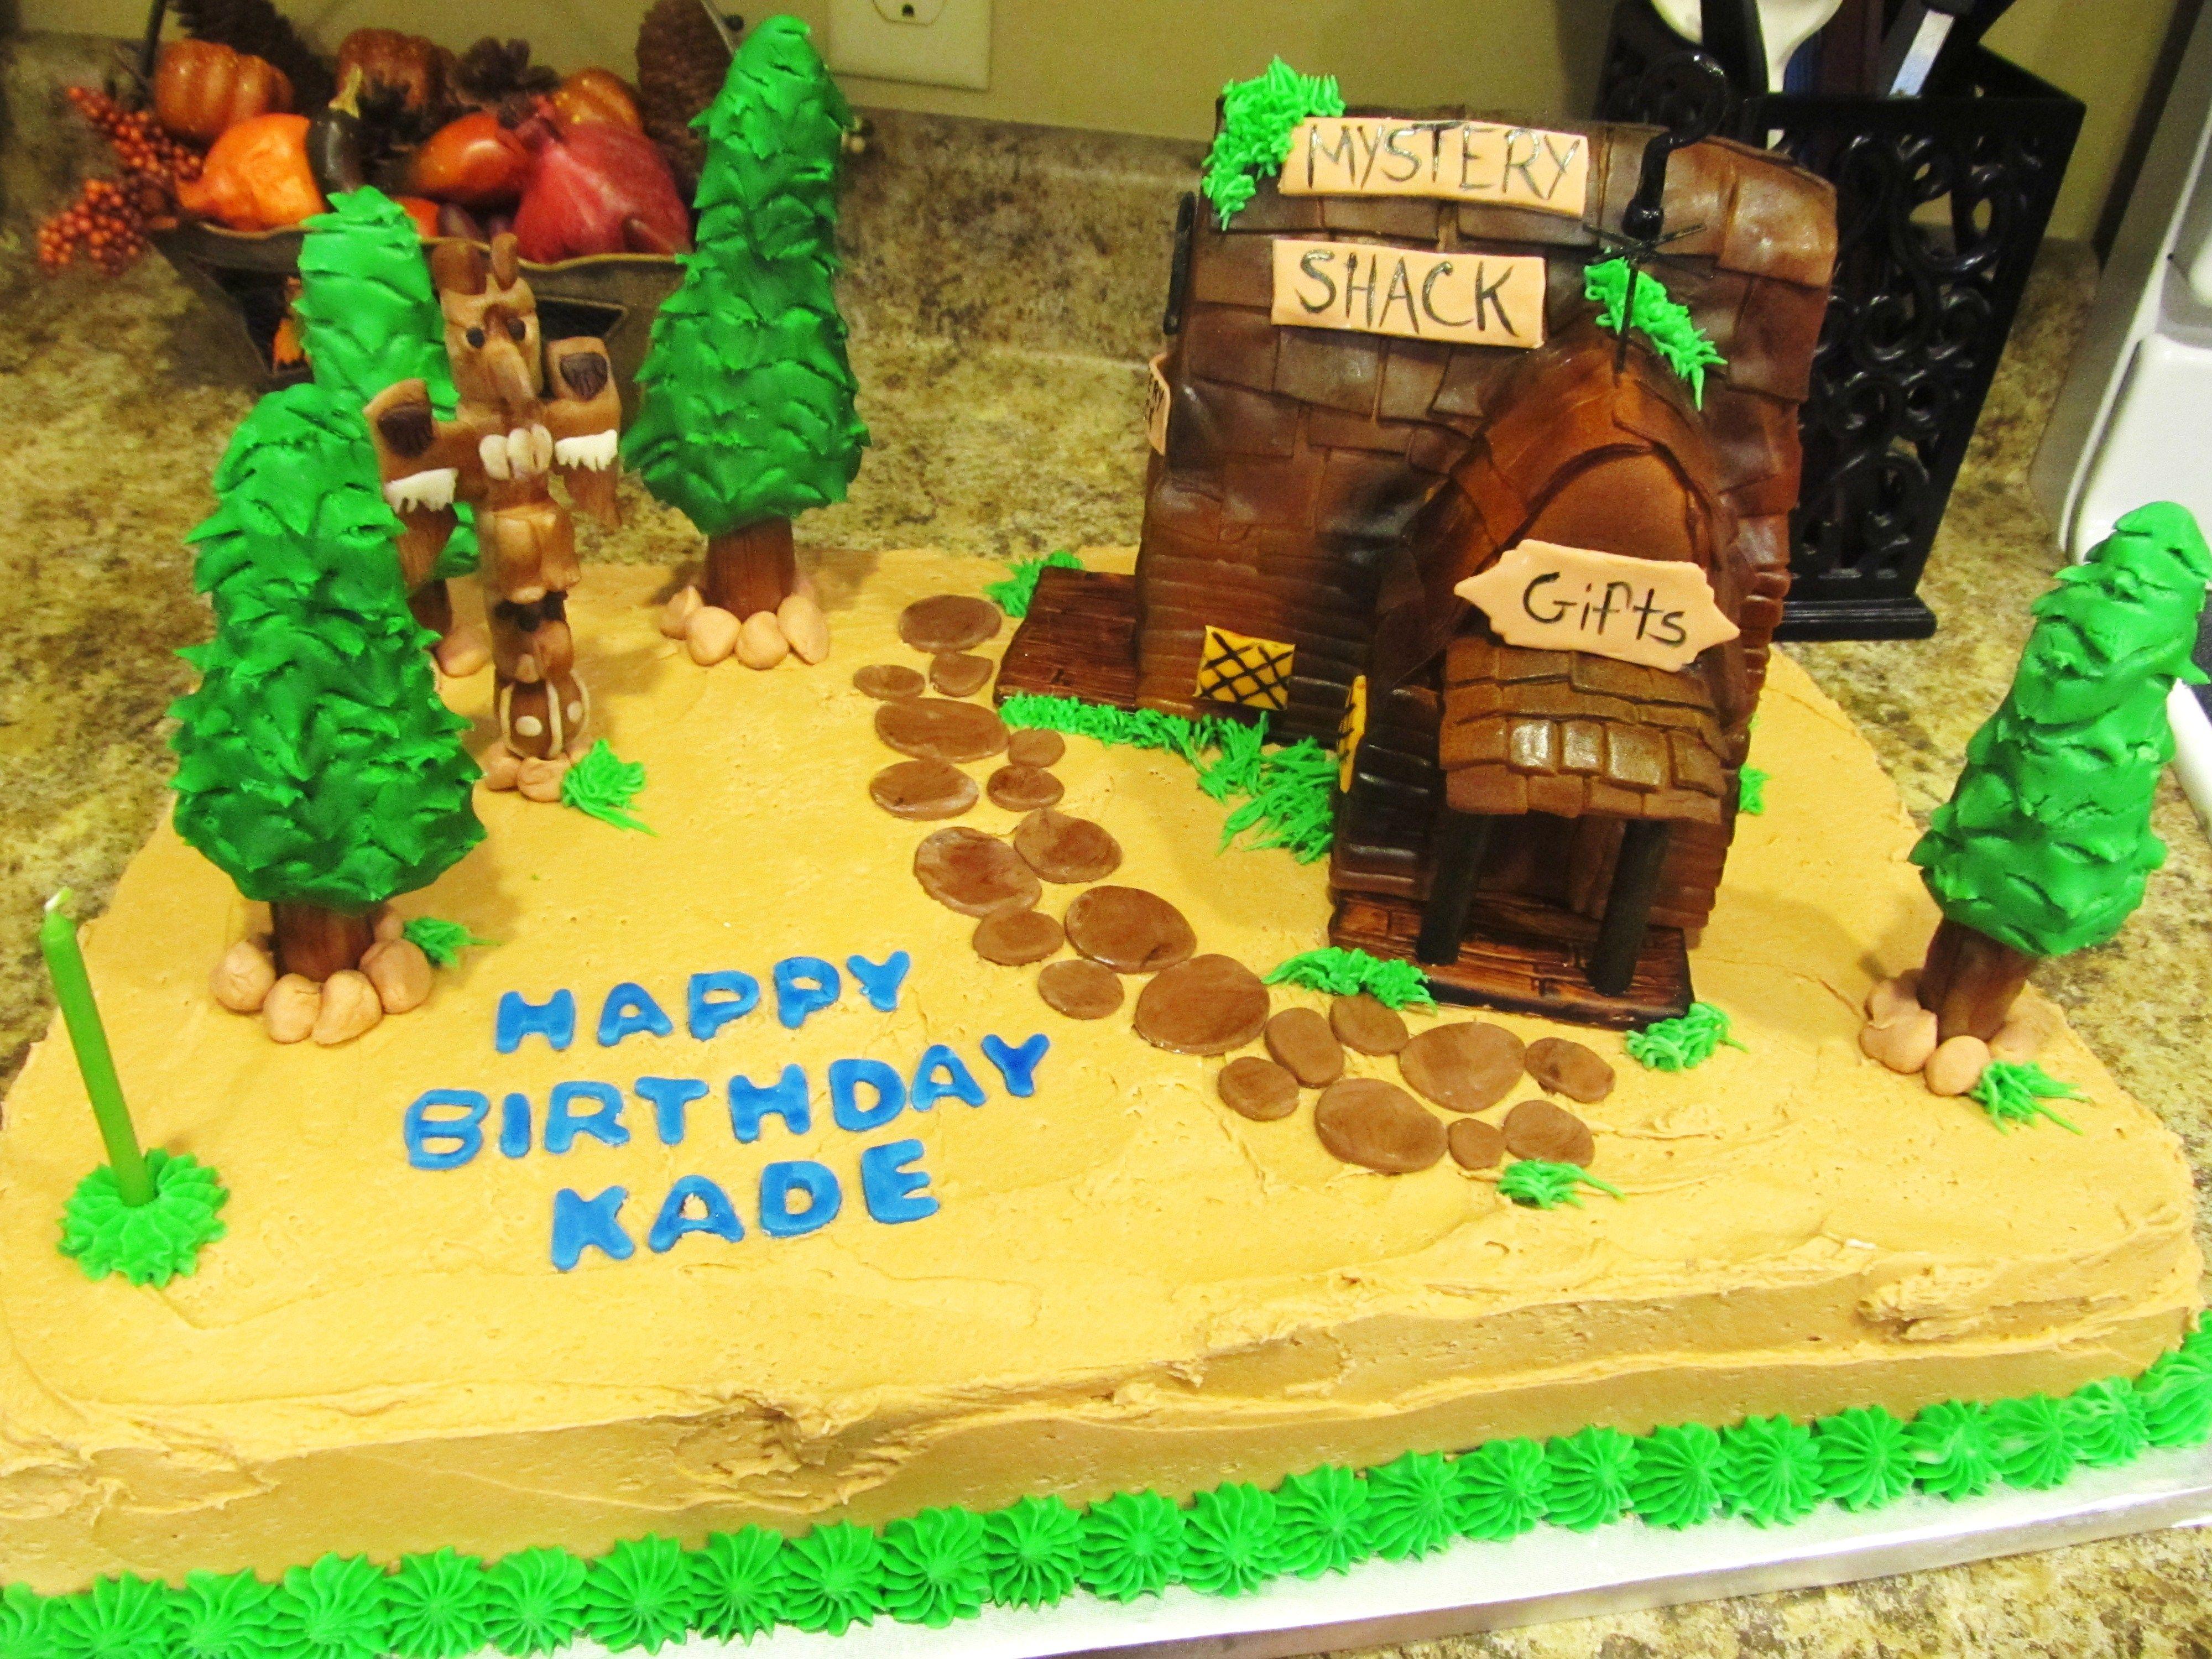 Google gravity theme - Kade S 11th Bday Party Theme Was Gravity Falls